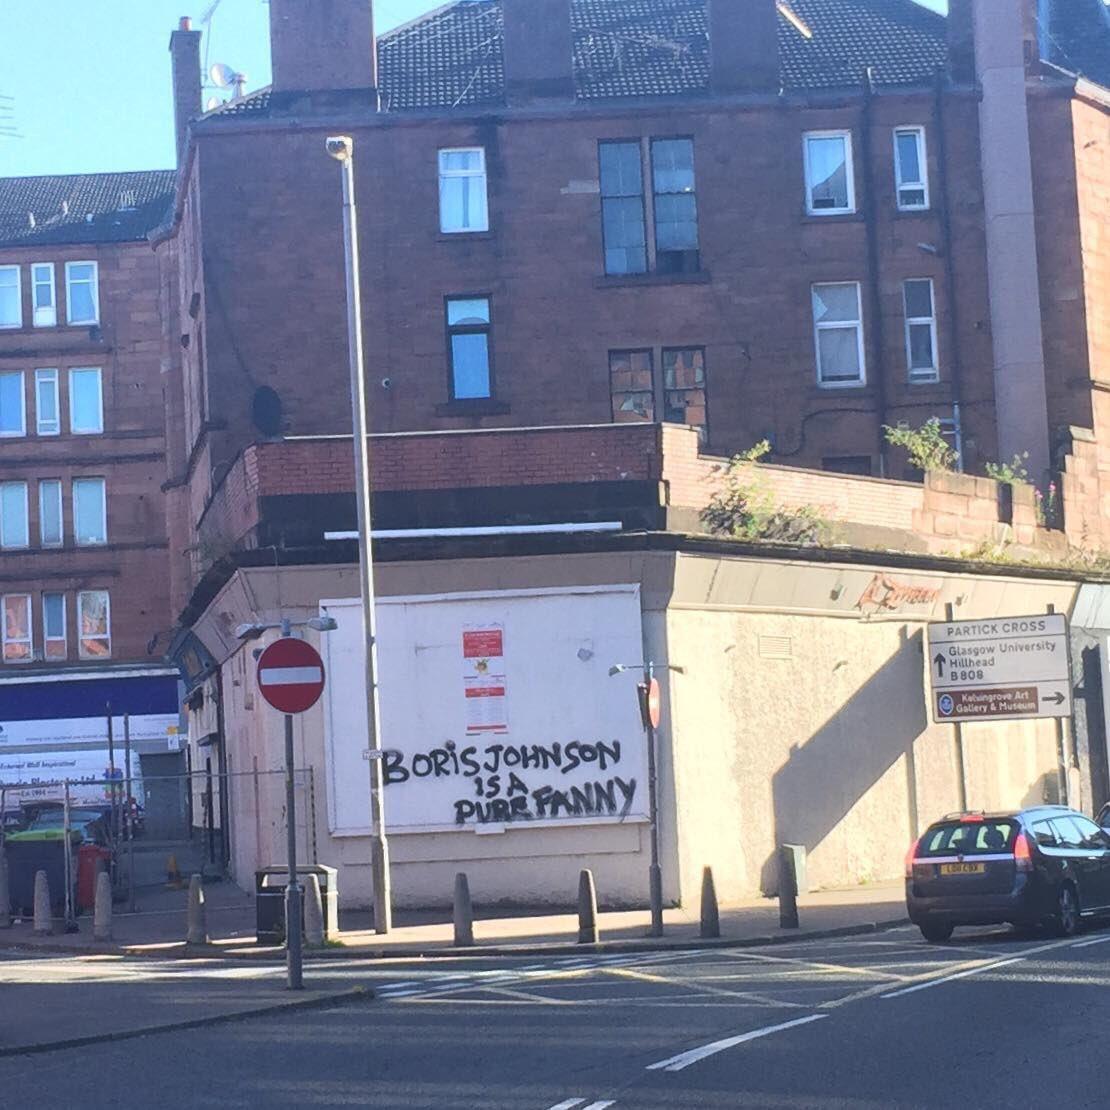 Oh Glasgow. https://t.co/3P8VhYFSNq